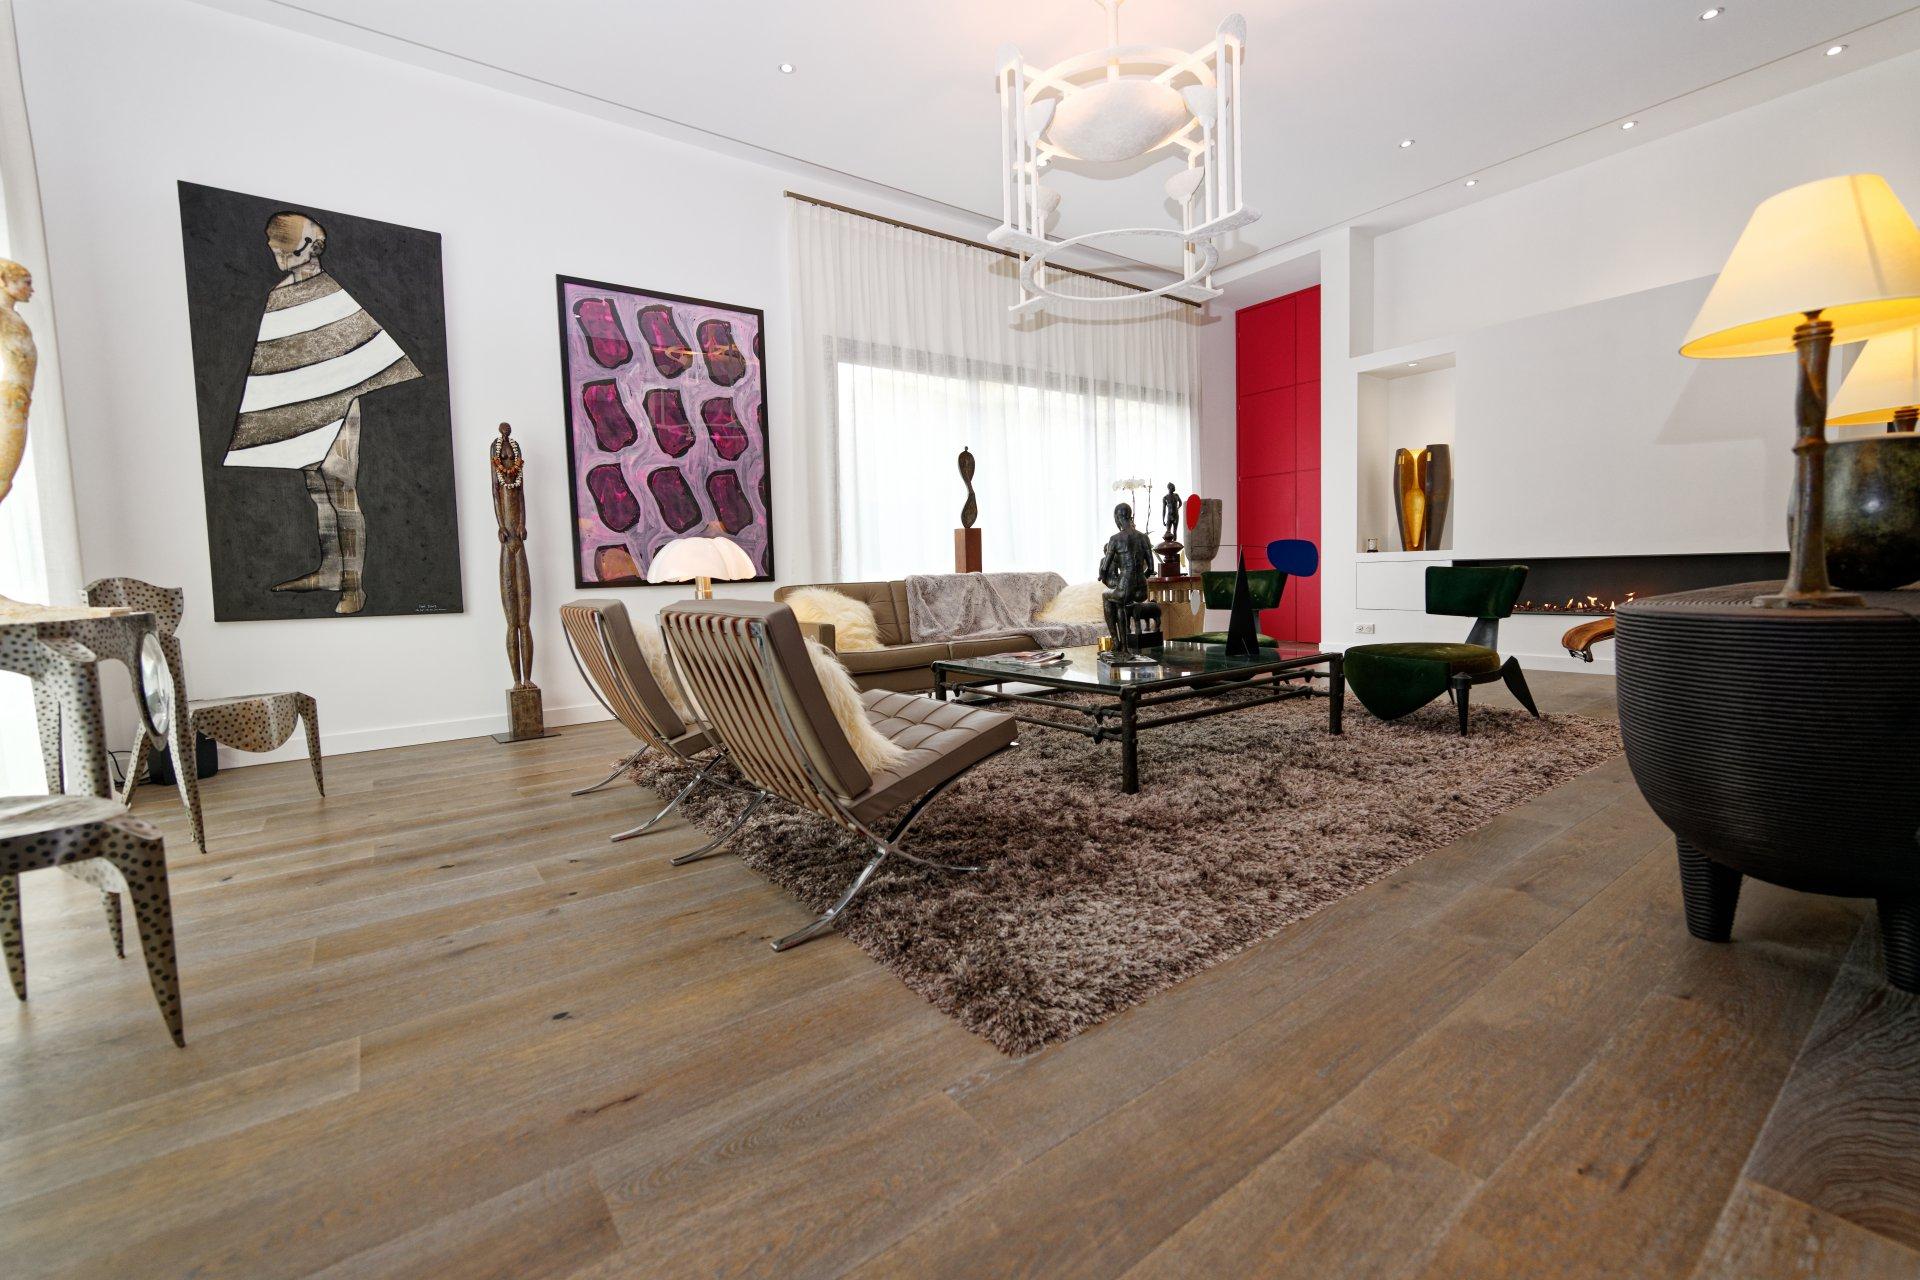 Salon, cheminée, plafond 3m57